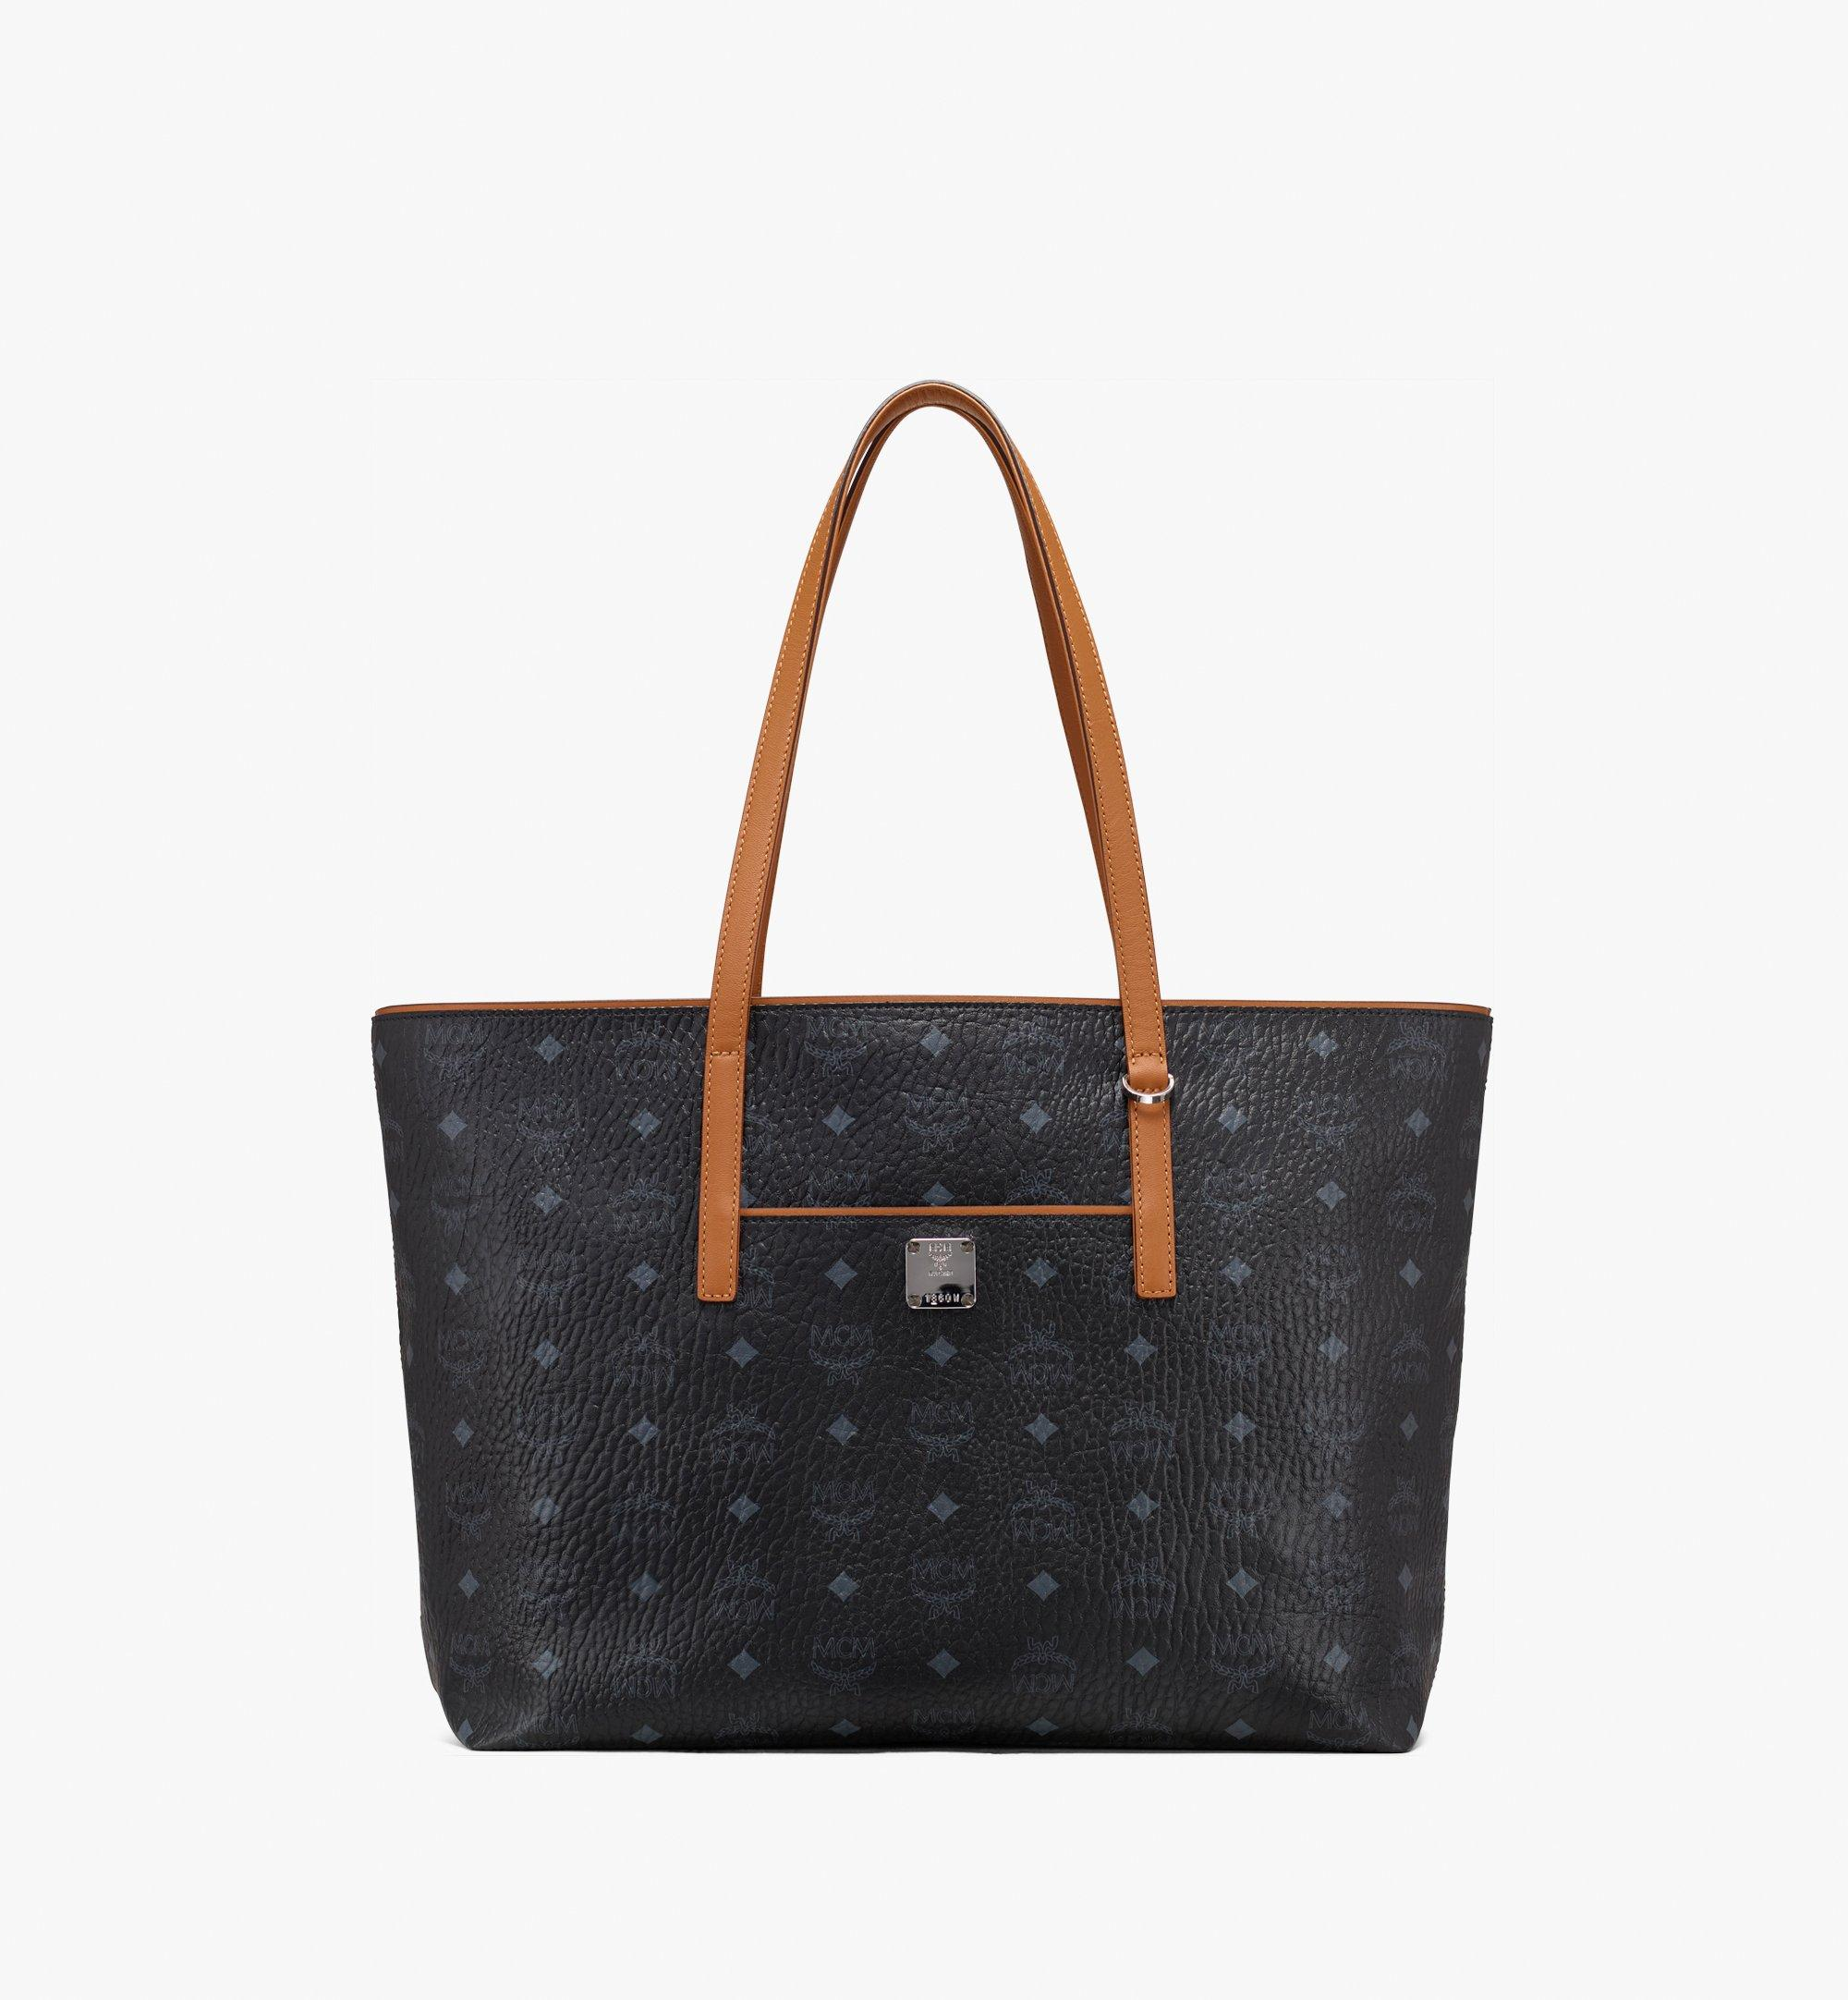 MCM Anya Top Zip Shopper in Visetos Black MWP9SVI61BK001 Alternate View 1